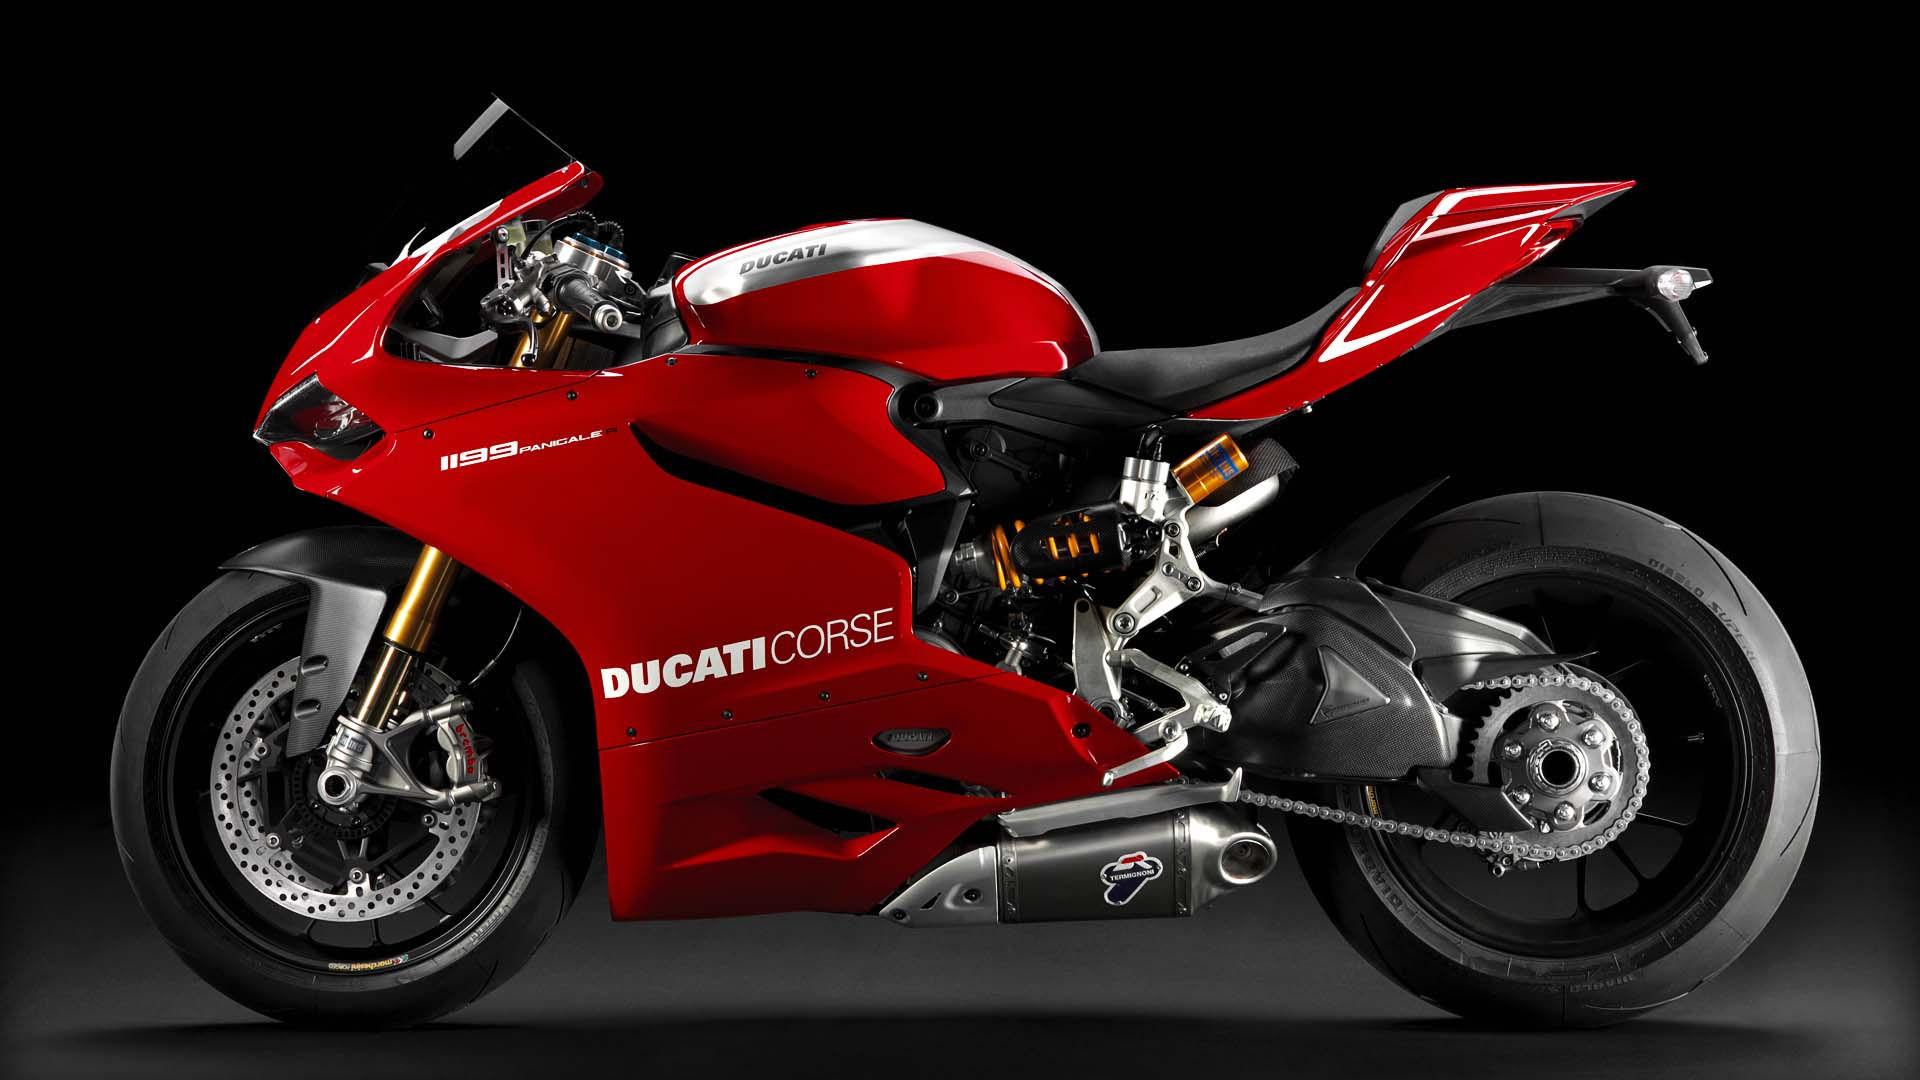 2014 Ducati  | Ducati 1199 Panigale R - Left Angle